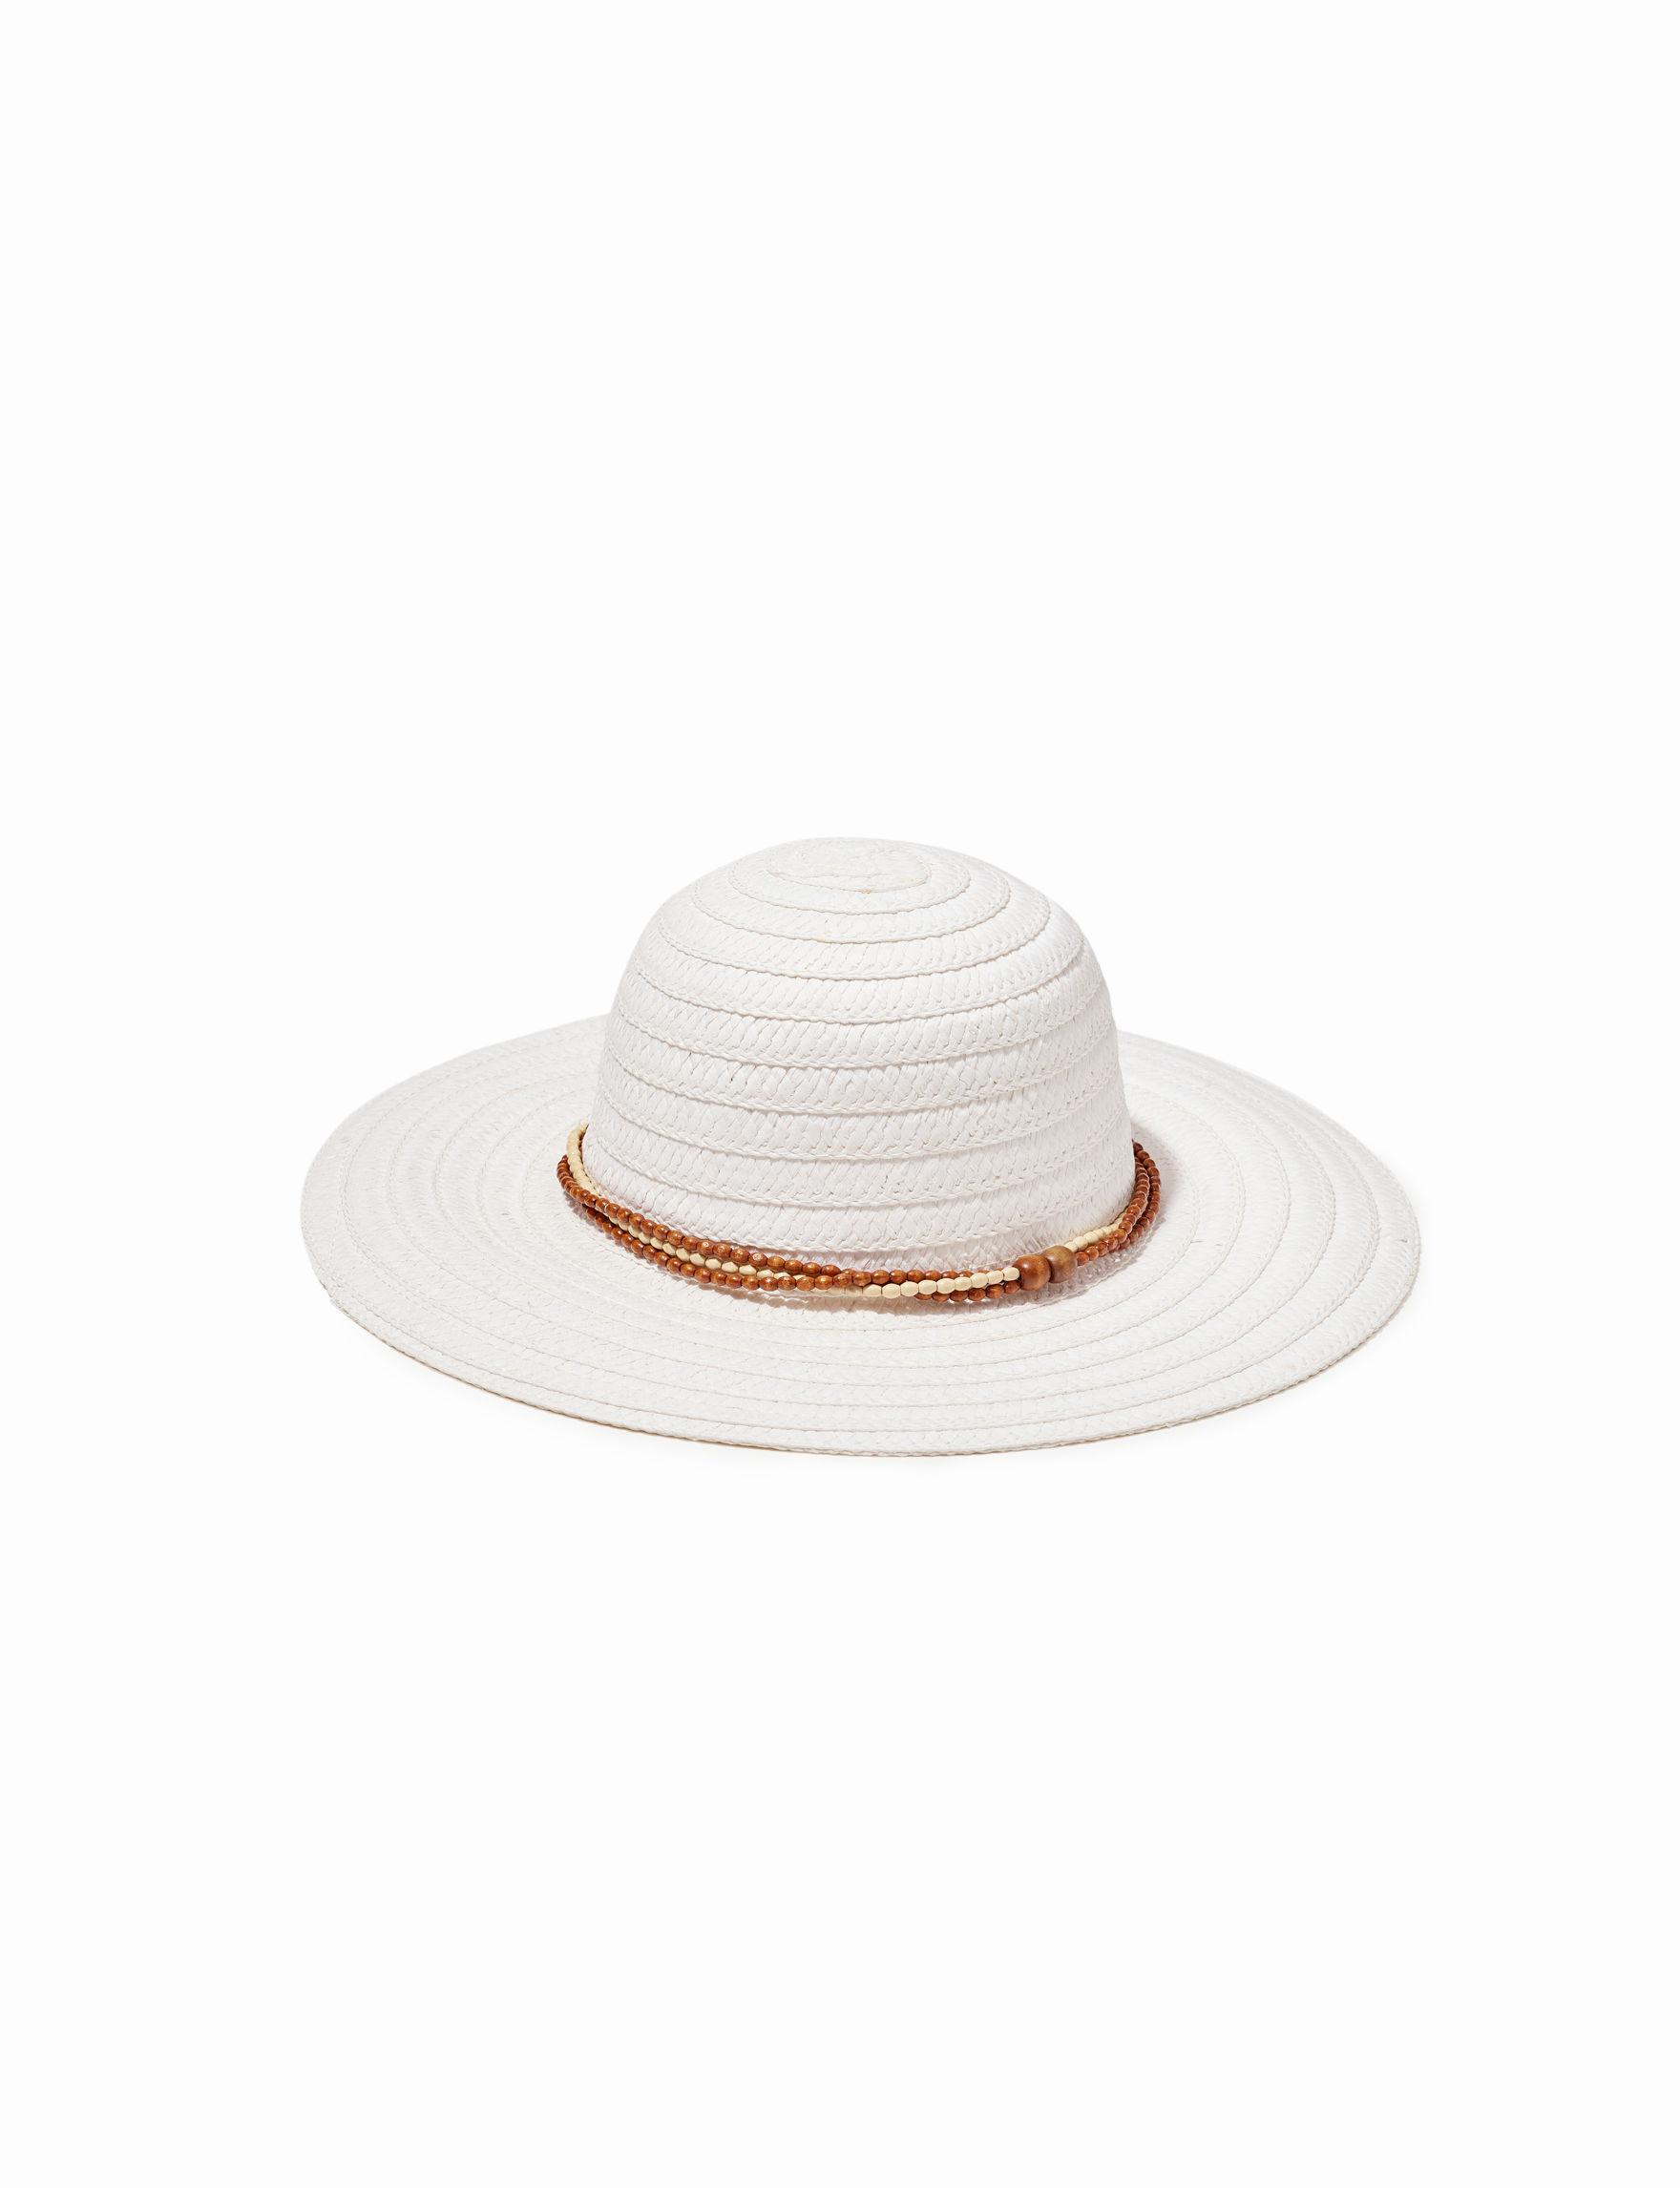 Columbino White Hats & Headwear